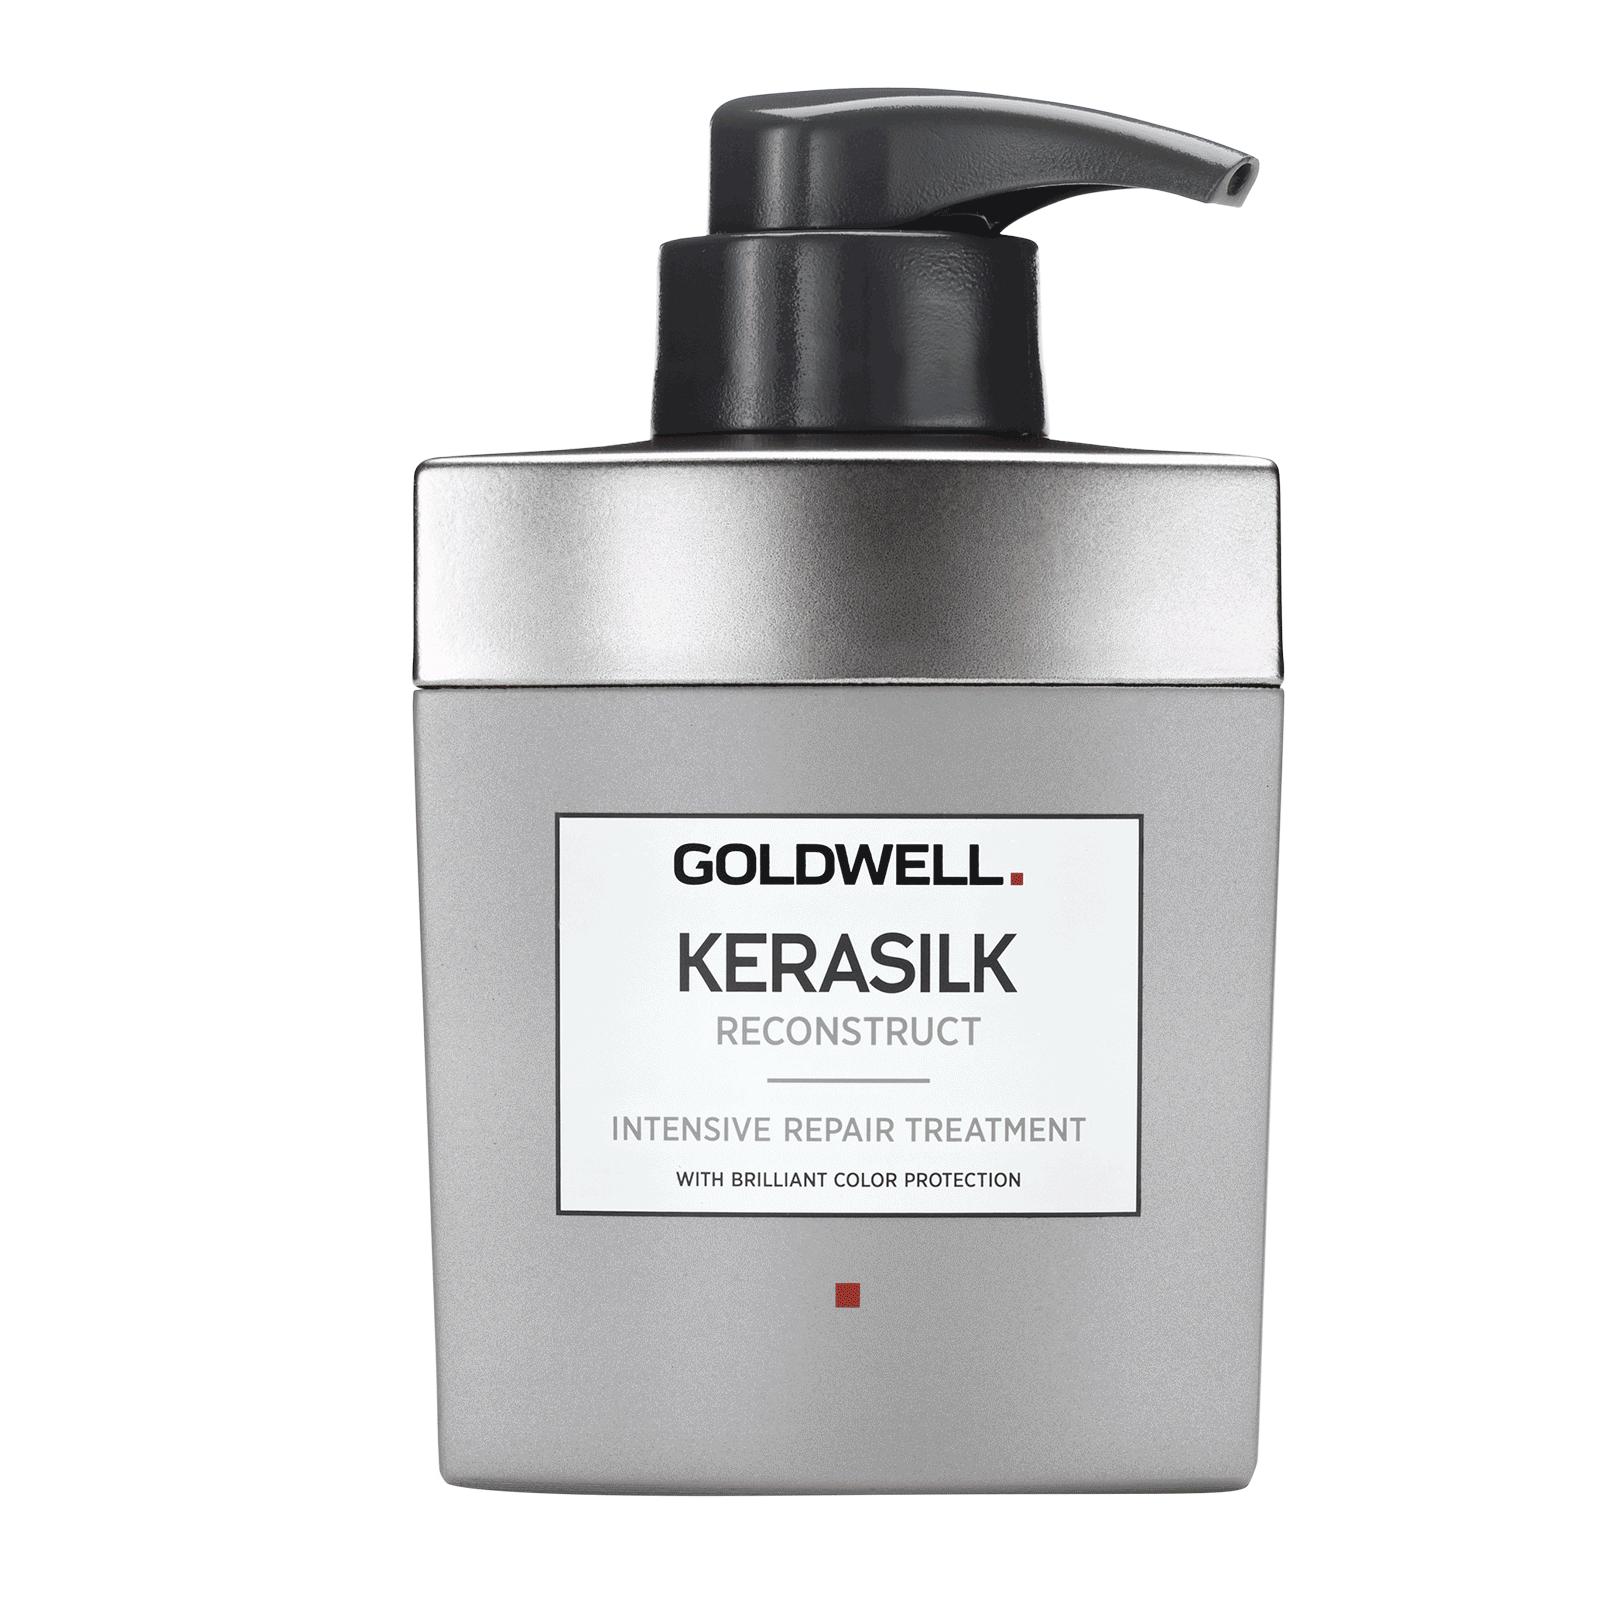 Goldwell USA Kerasilk - Reconstruct Intensive Repair Mask  16.9oz